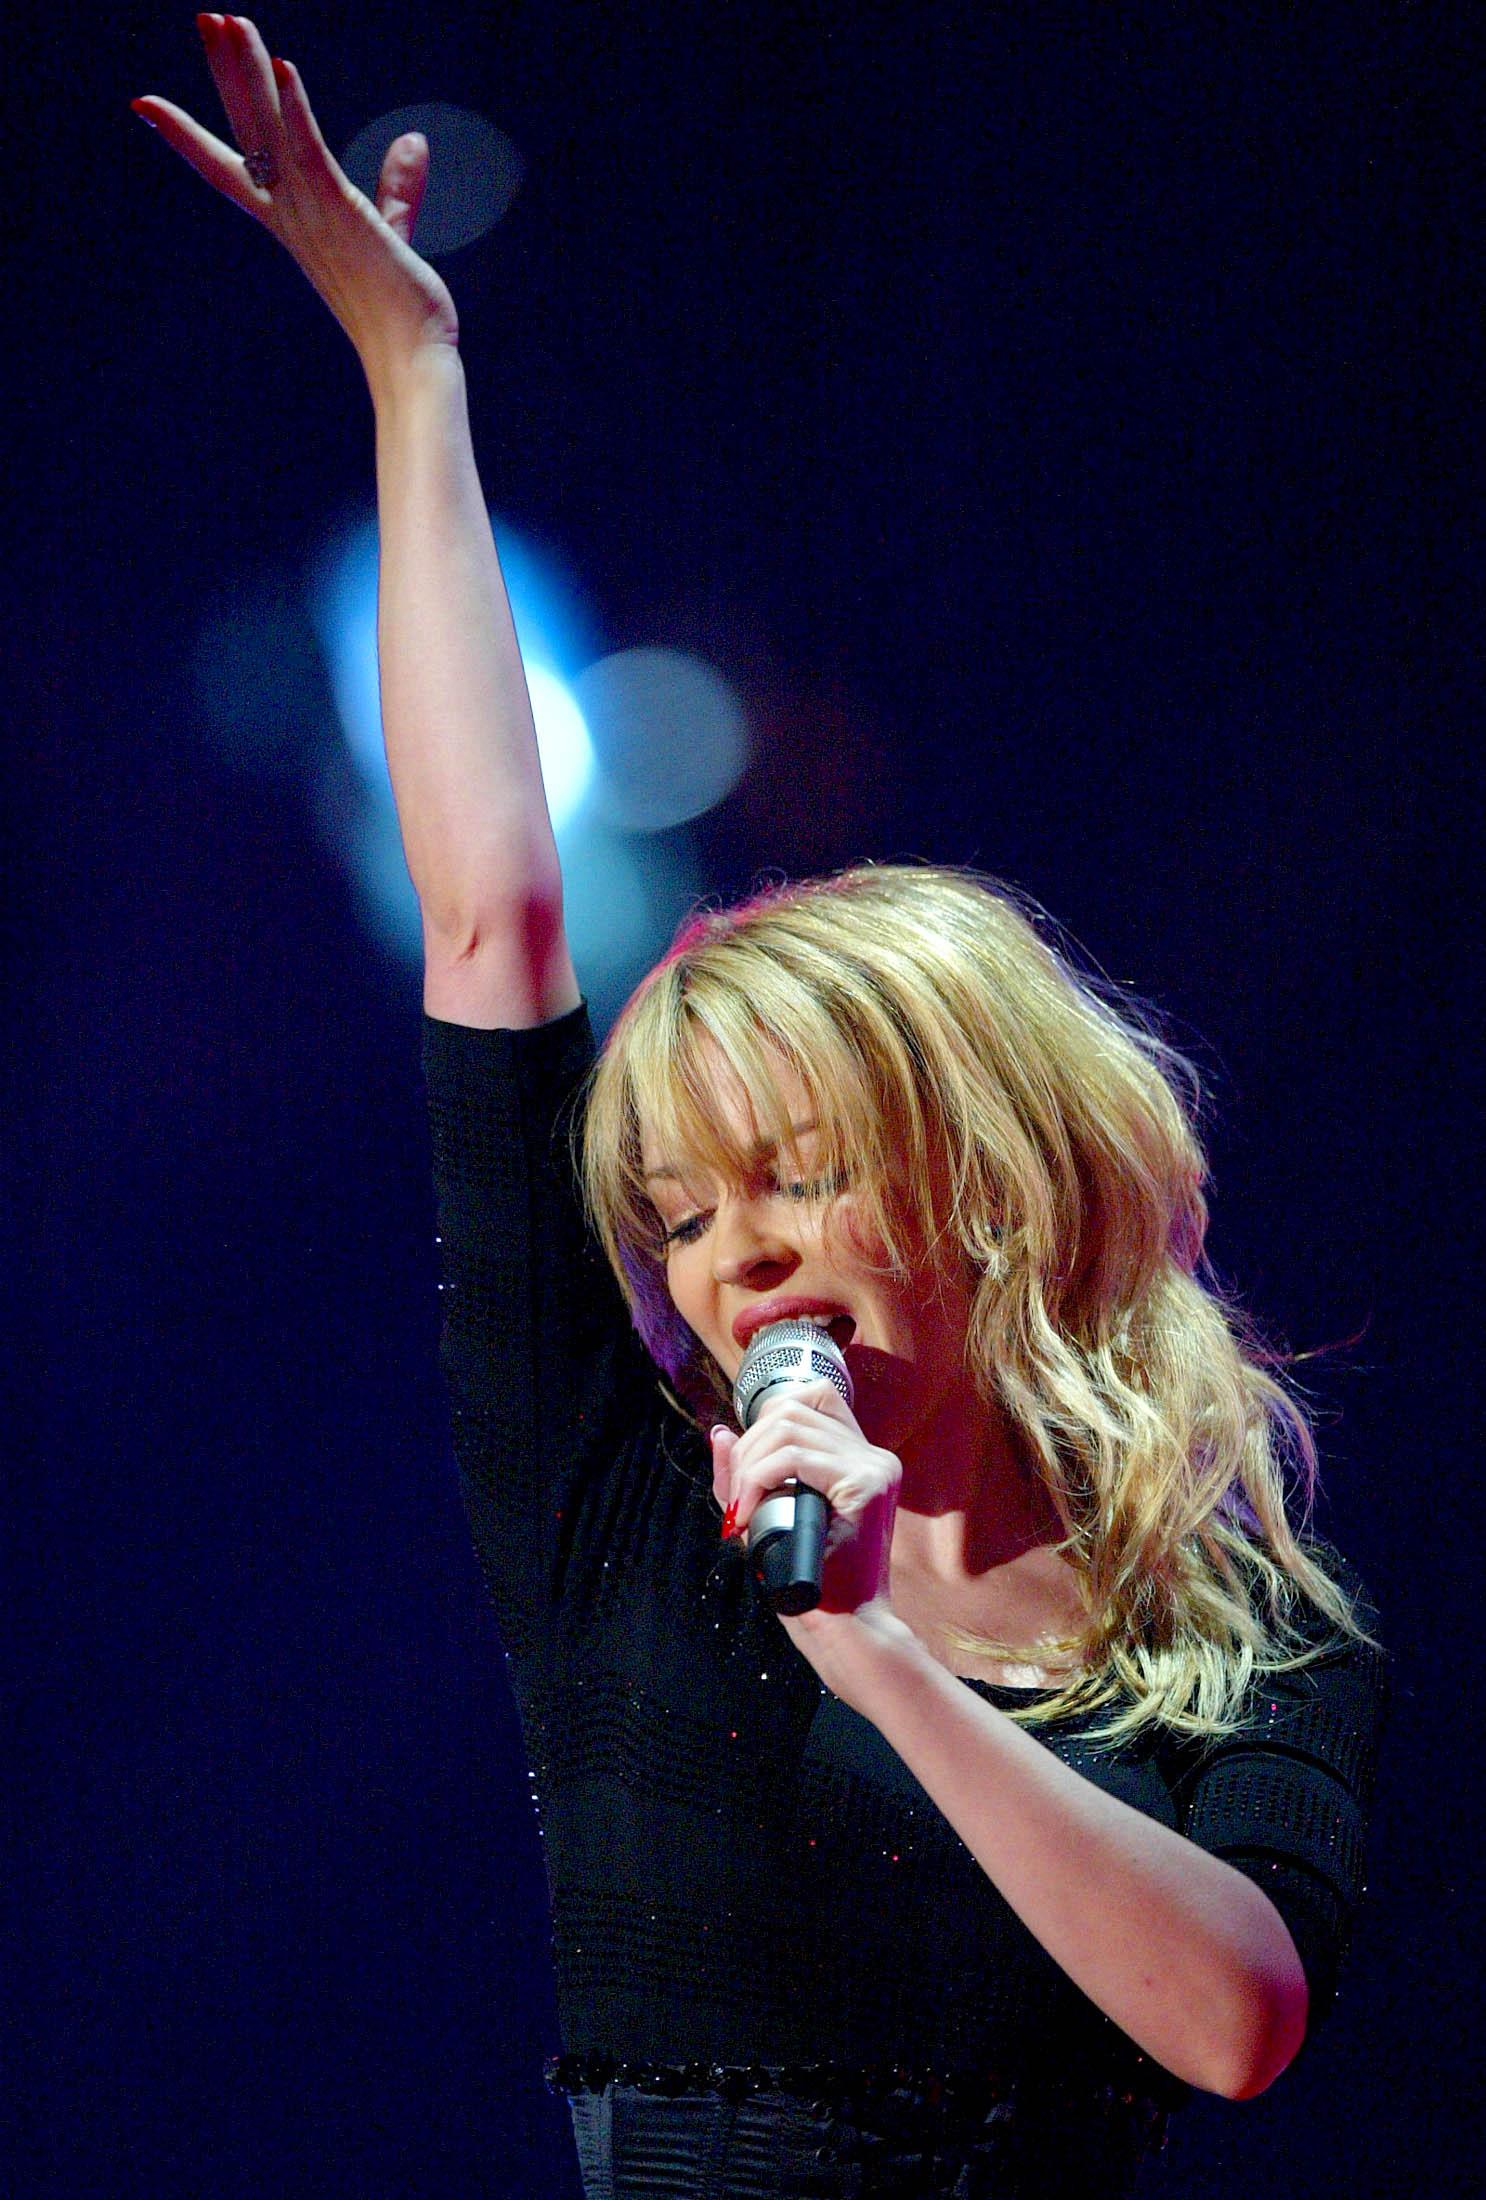 Kylie Minogue Photo 25 Of 1669 Pics, Wallpaper